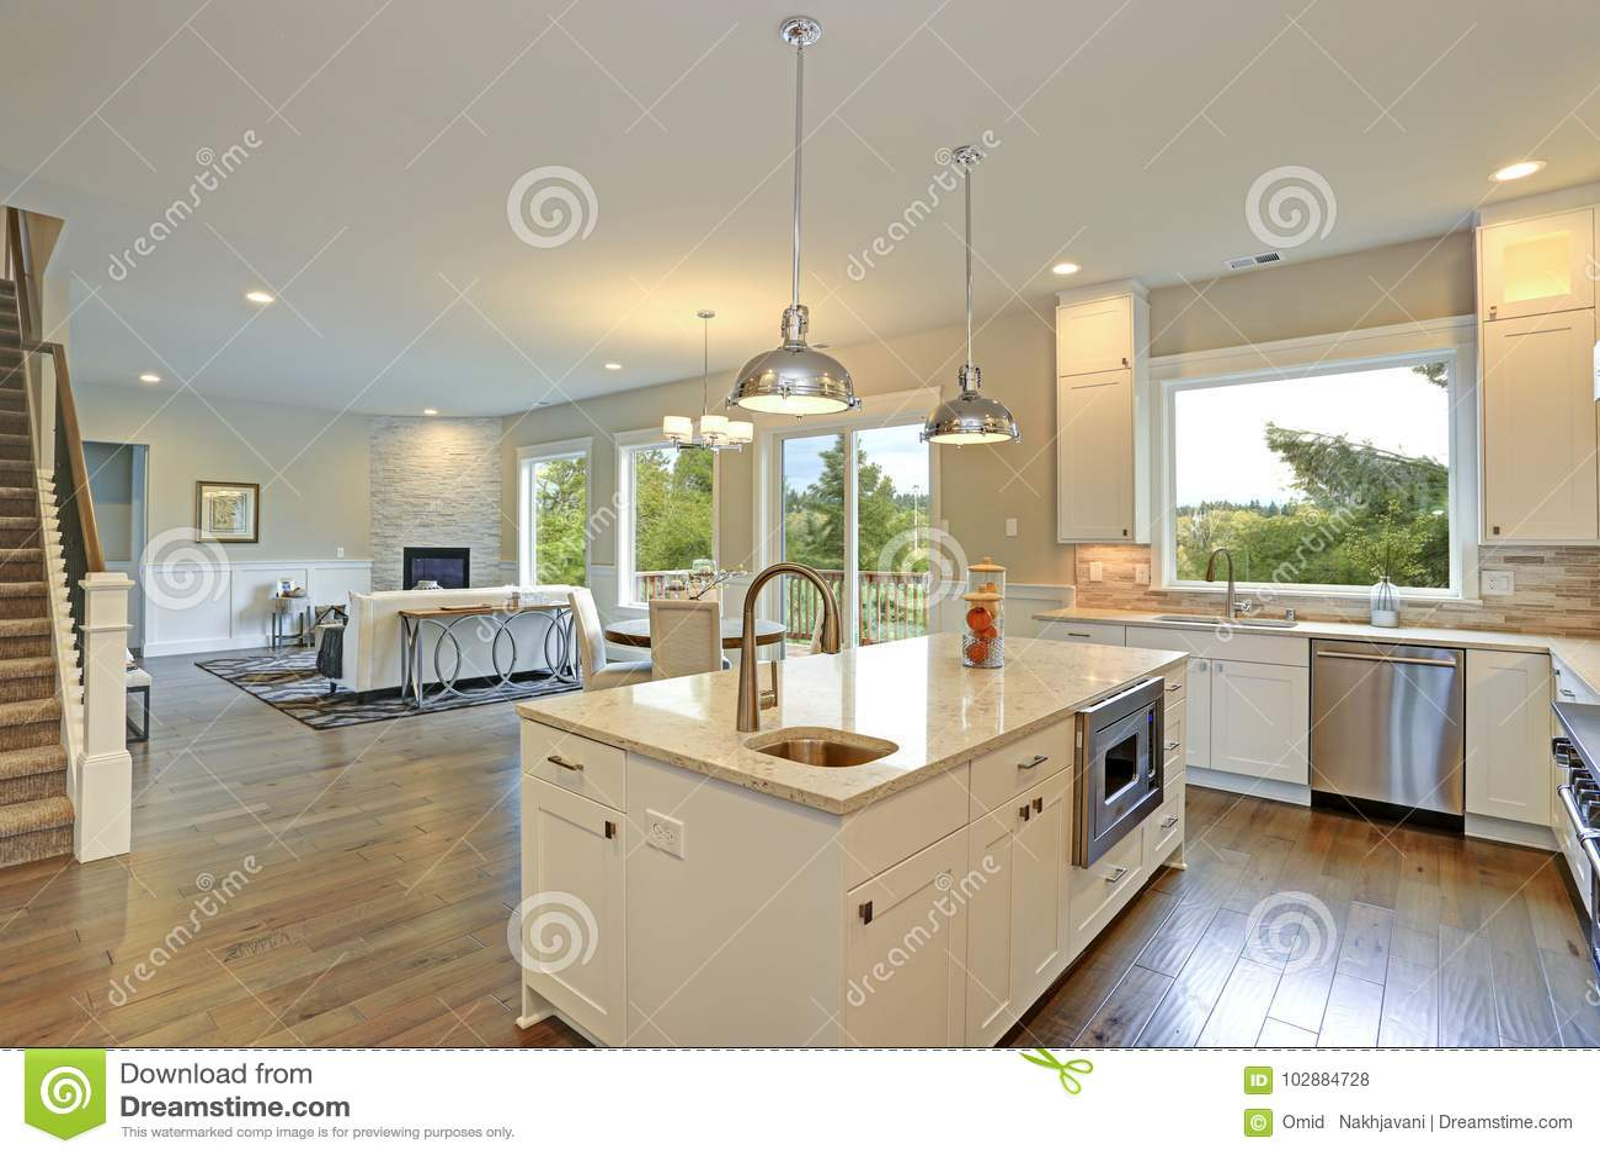 Luxury White Kitchen With Large Kitchen Island. Stock